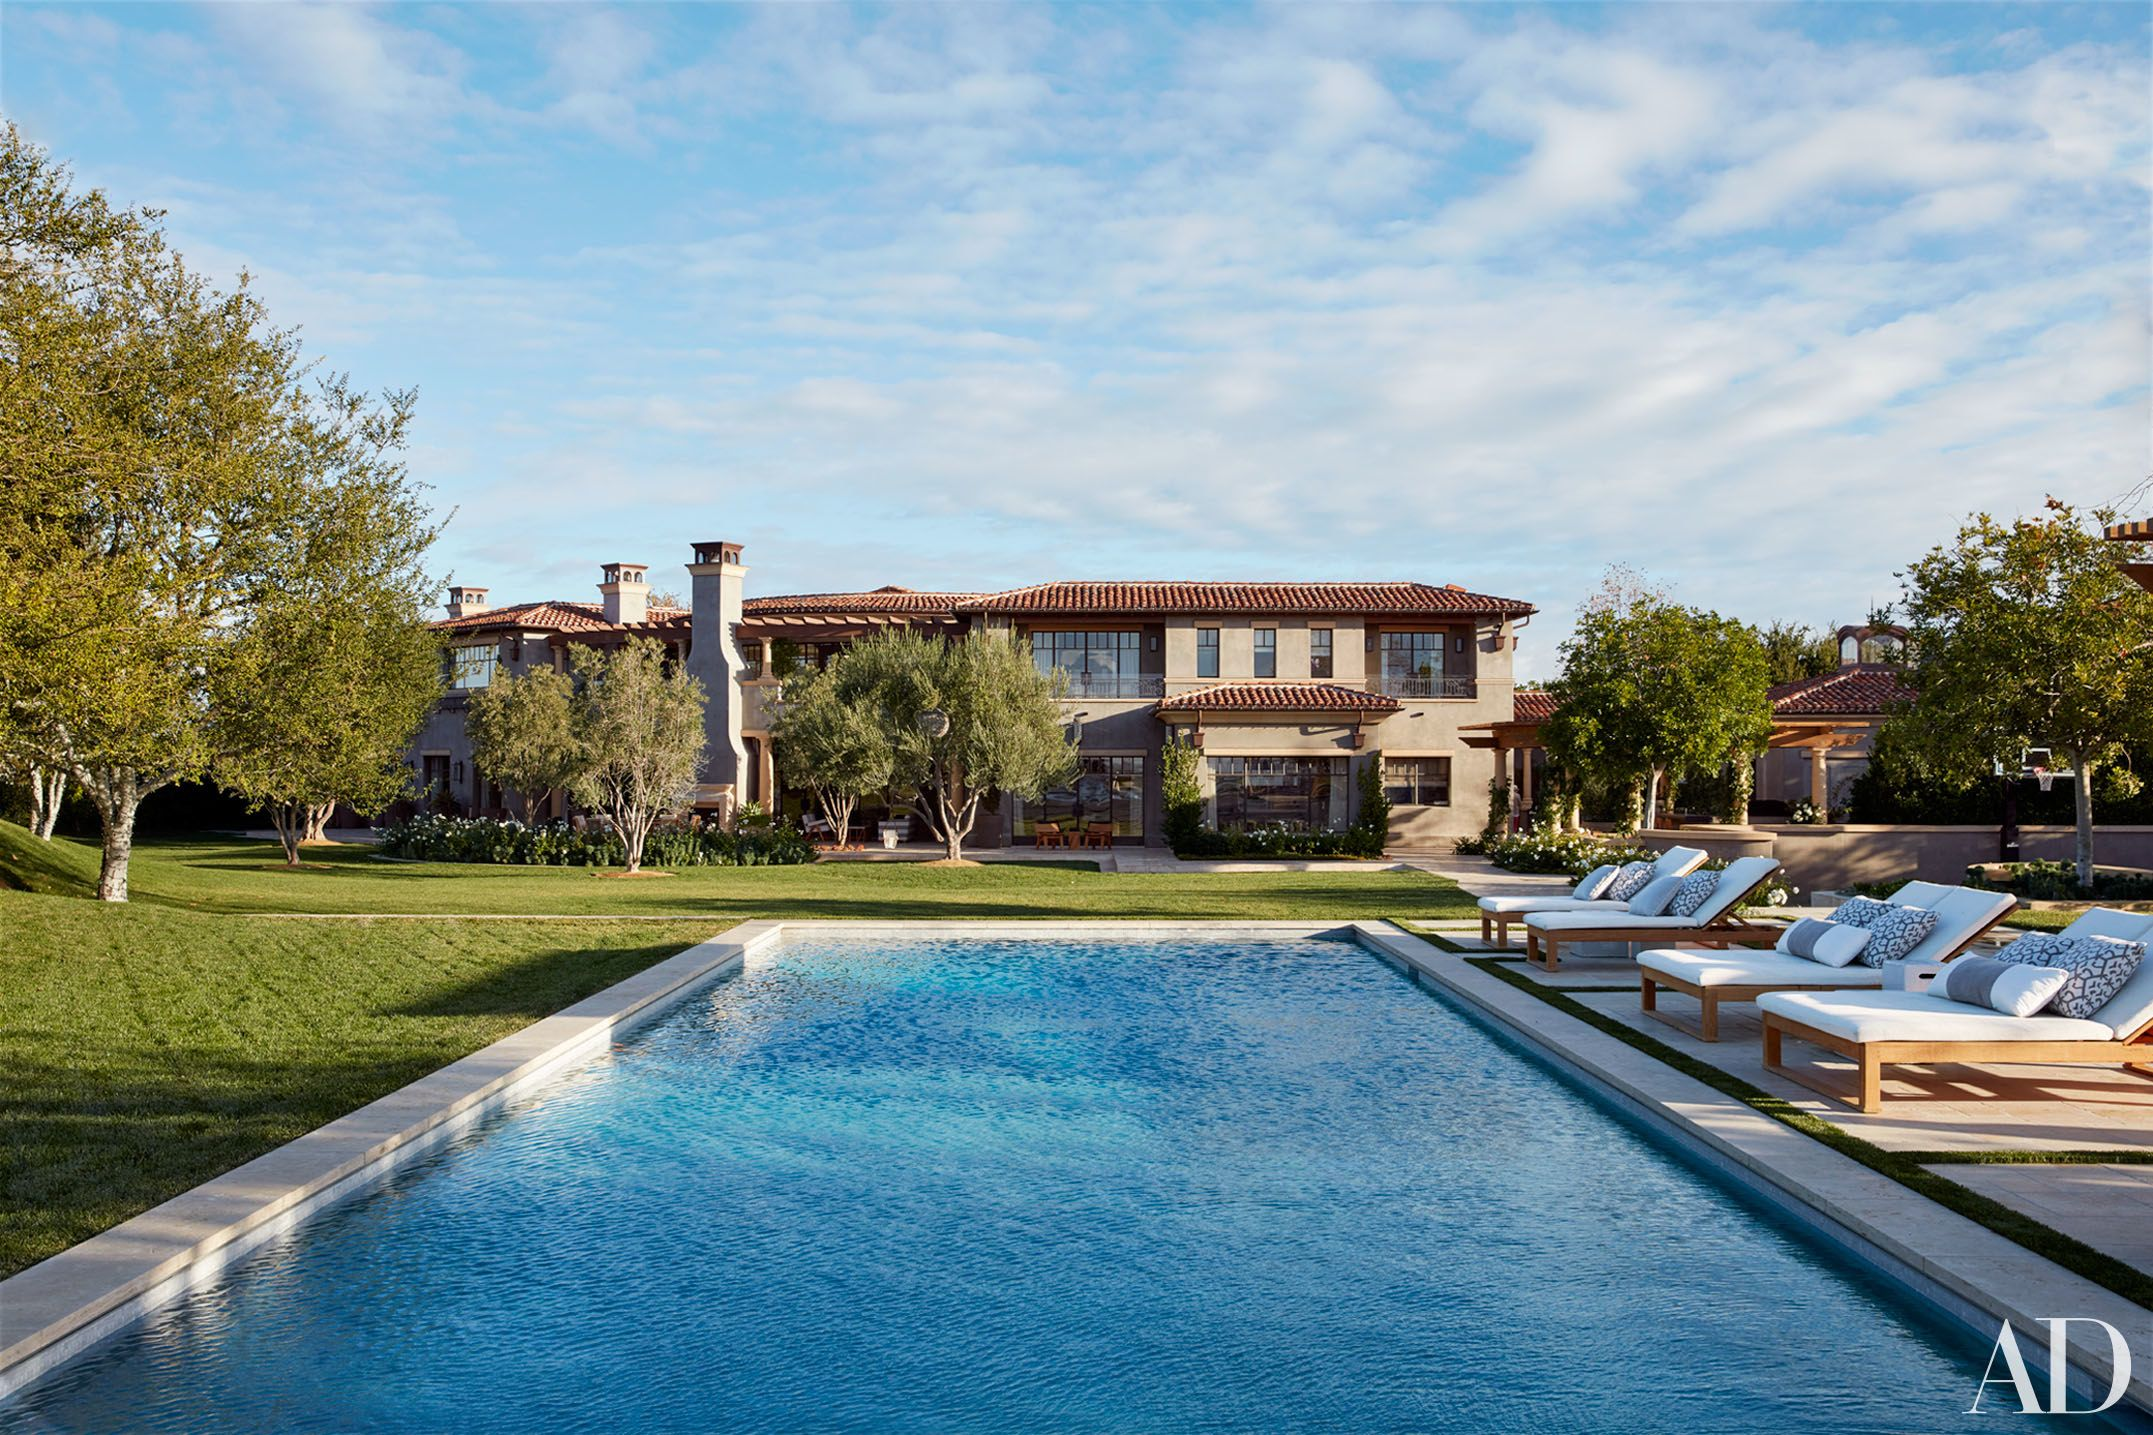 Khloe And Kourtney Kardashian Realize Their Dream Homes In California Kourtney Kardashian House Celebrity Houses Kardashians House